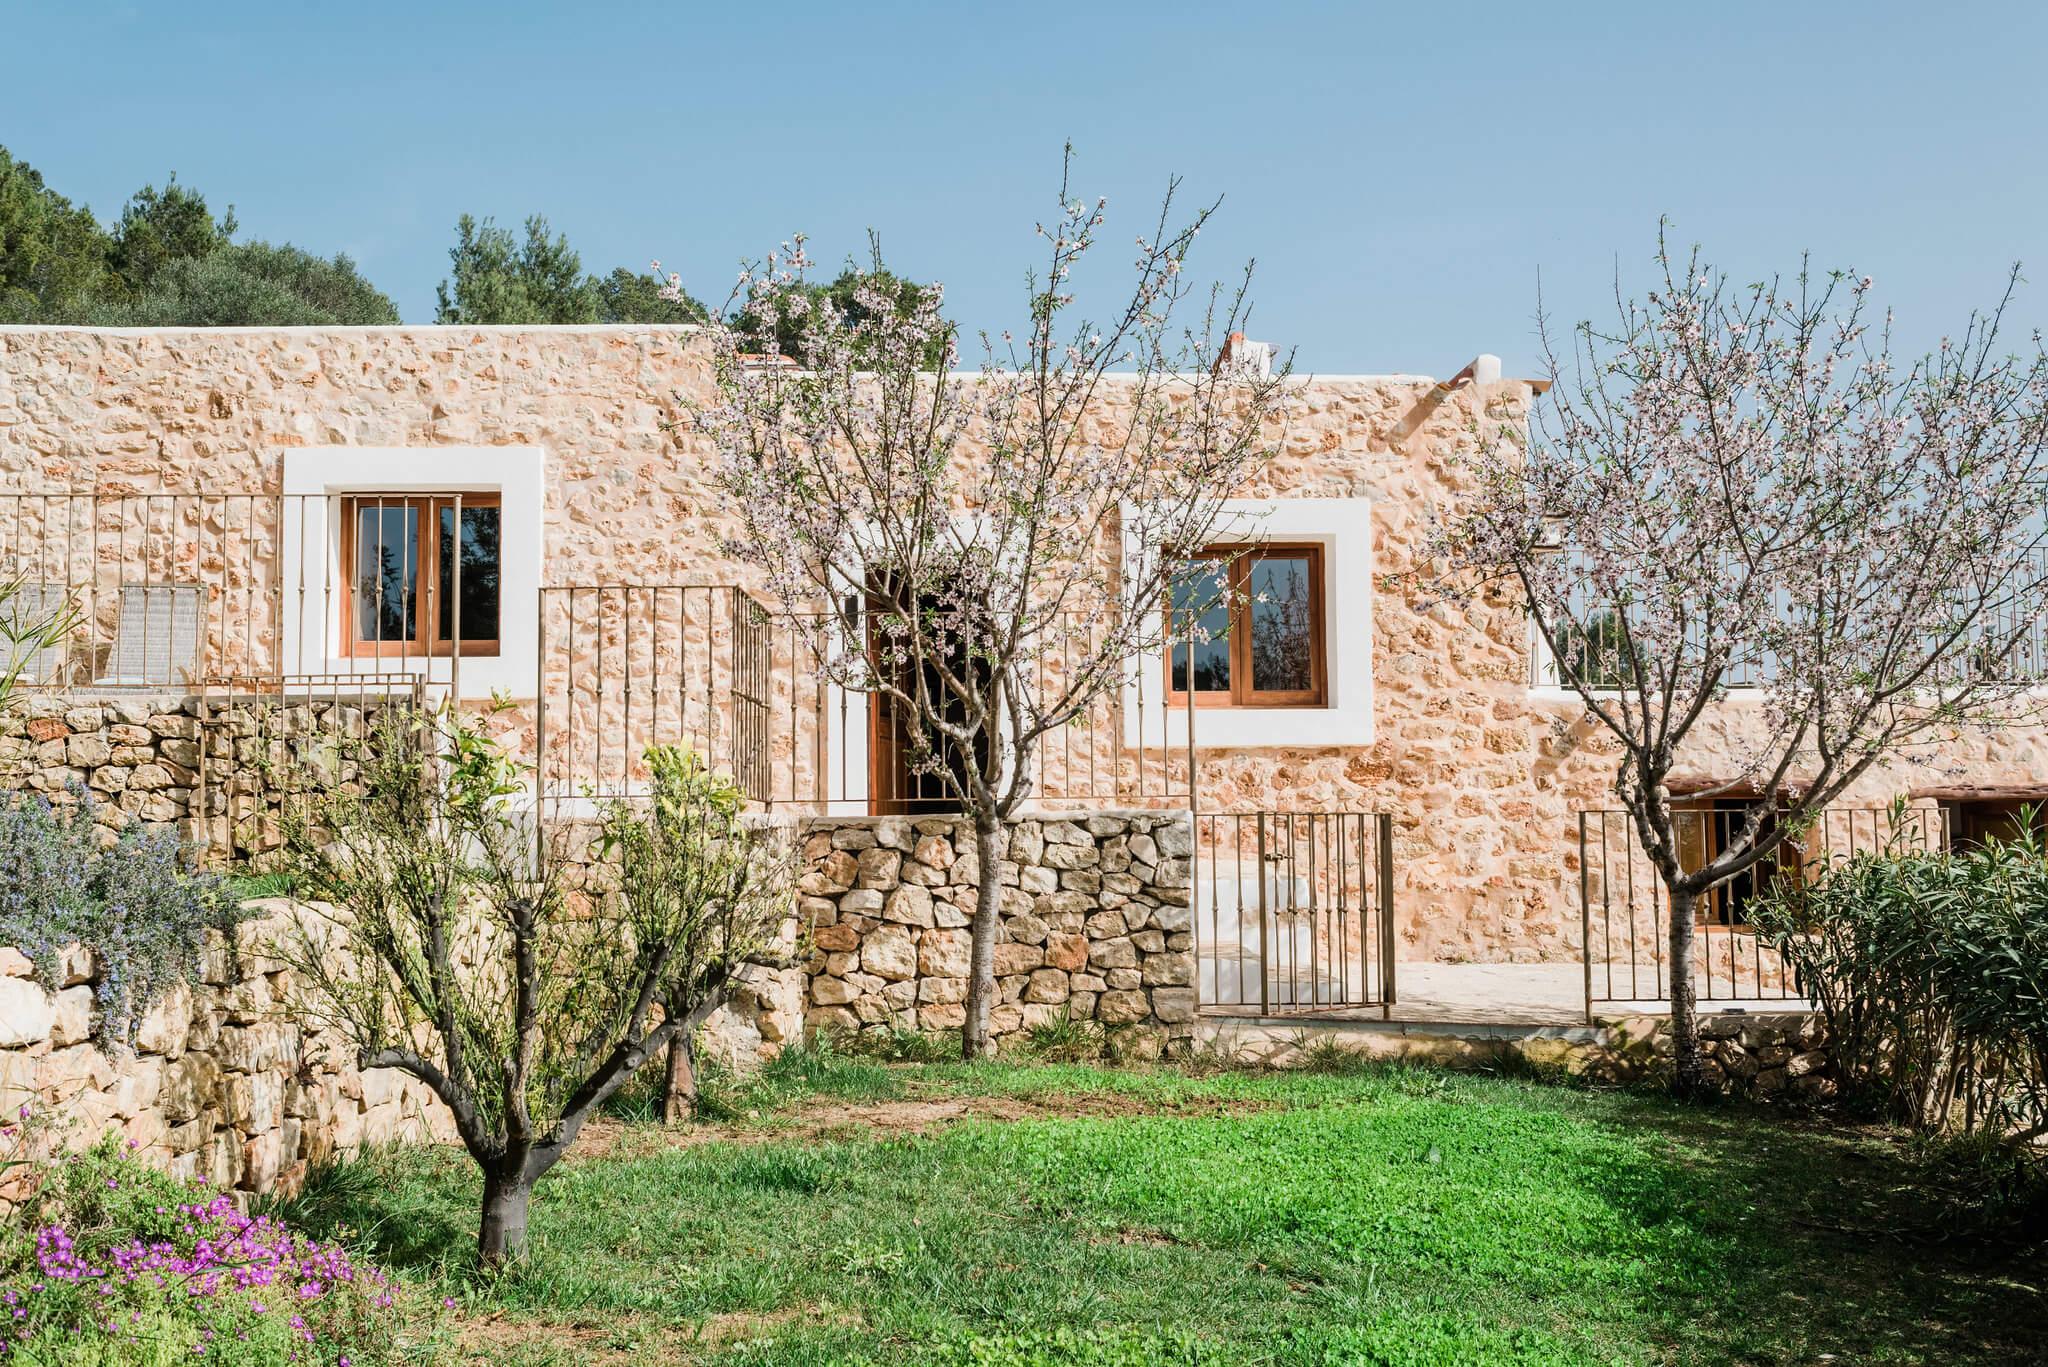 https://www.white-ibiza.com/wp-content/uploads/2020/06/white-ibiza-villas-los-corrales-exterior-house-trees.jpg